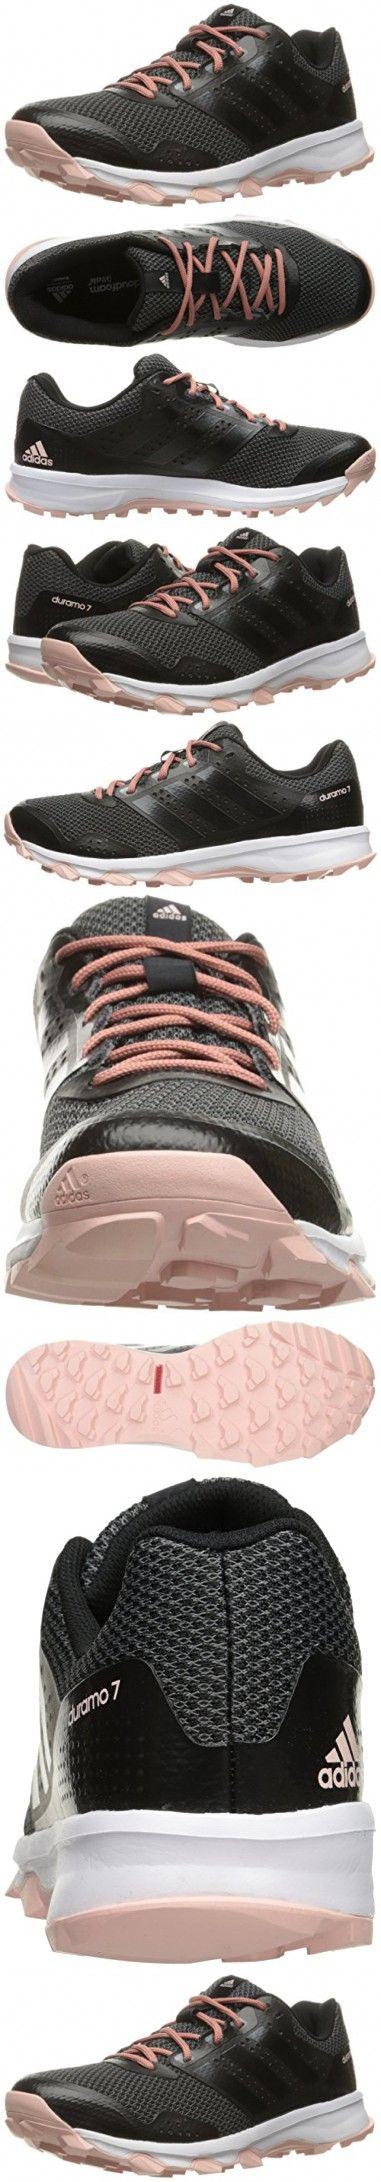 Zapatillas para caminar RYKA Women's Sky, Negra / Rosa, 8.5 W US